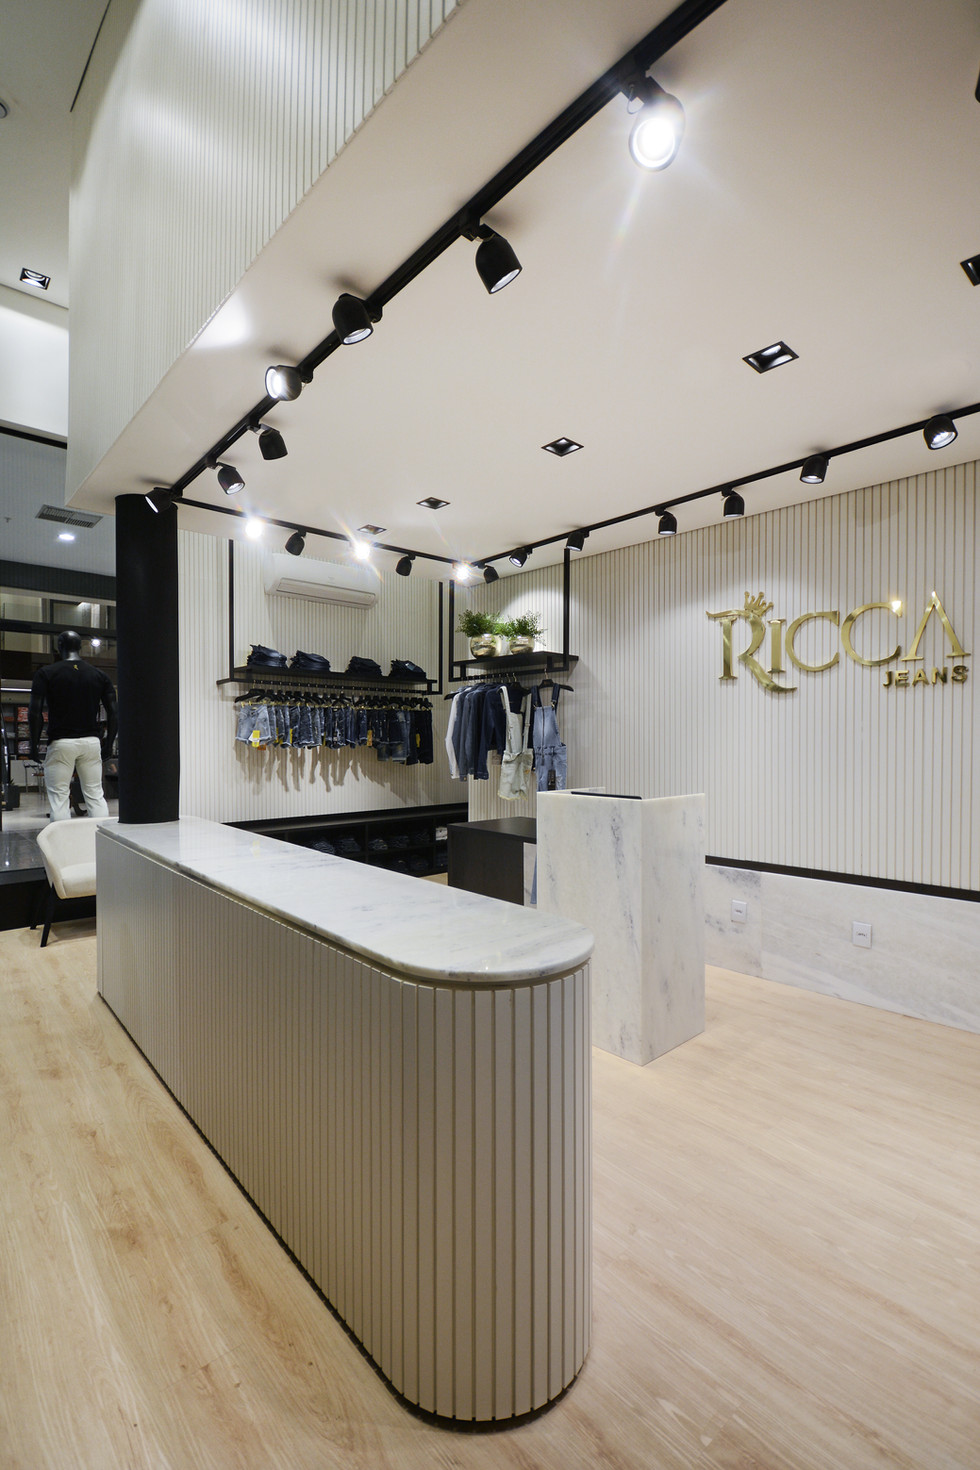 loja ricca jeans_7